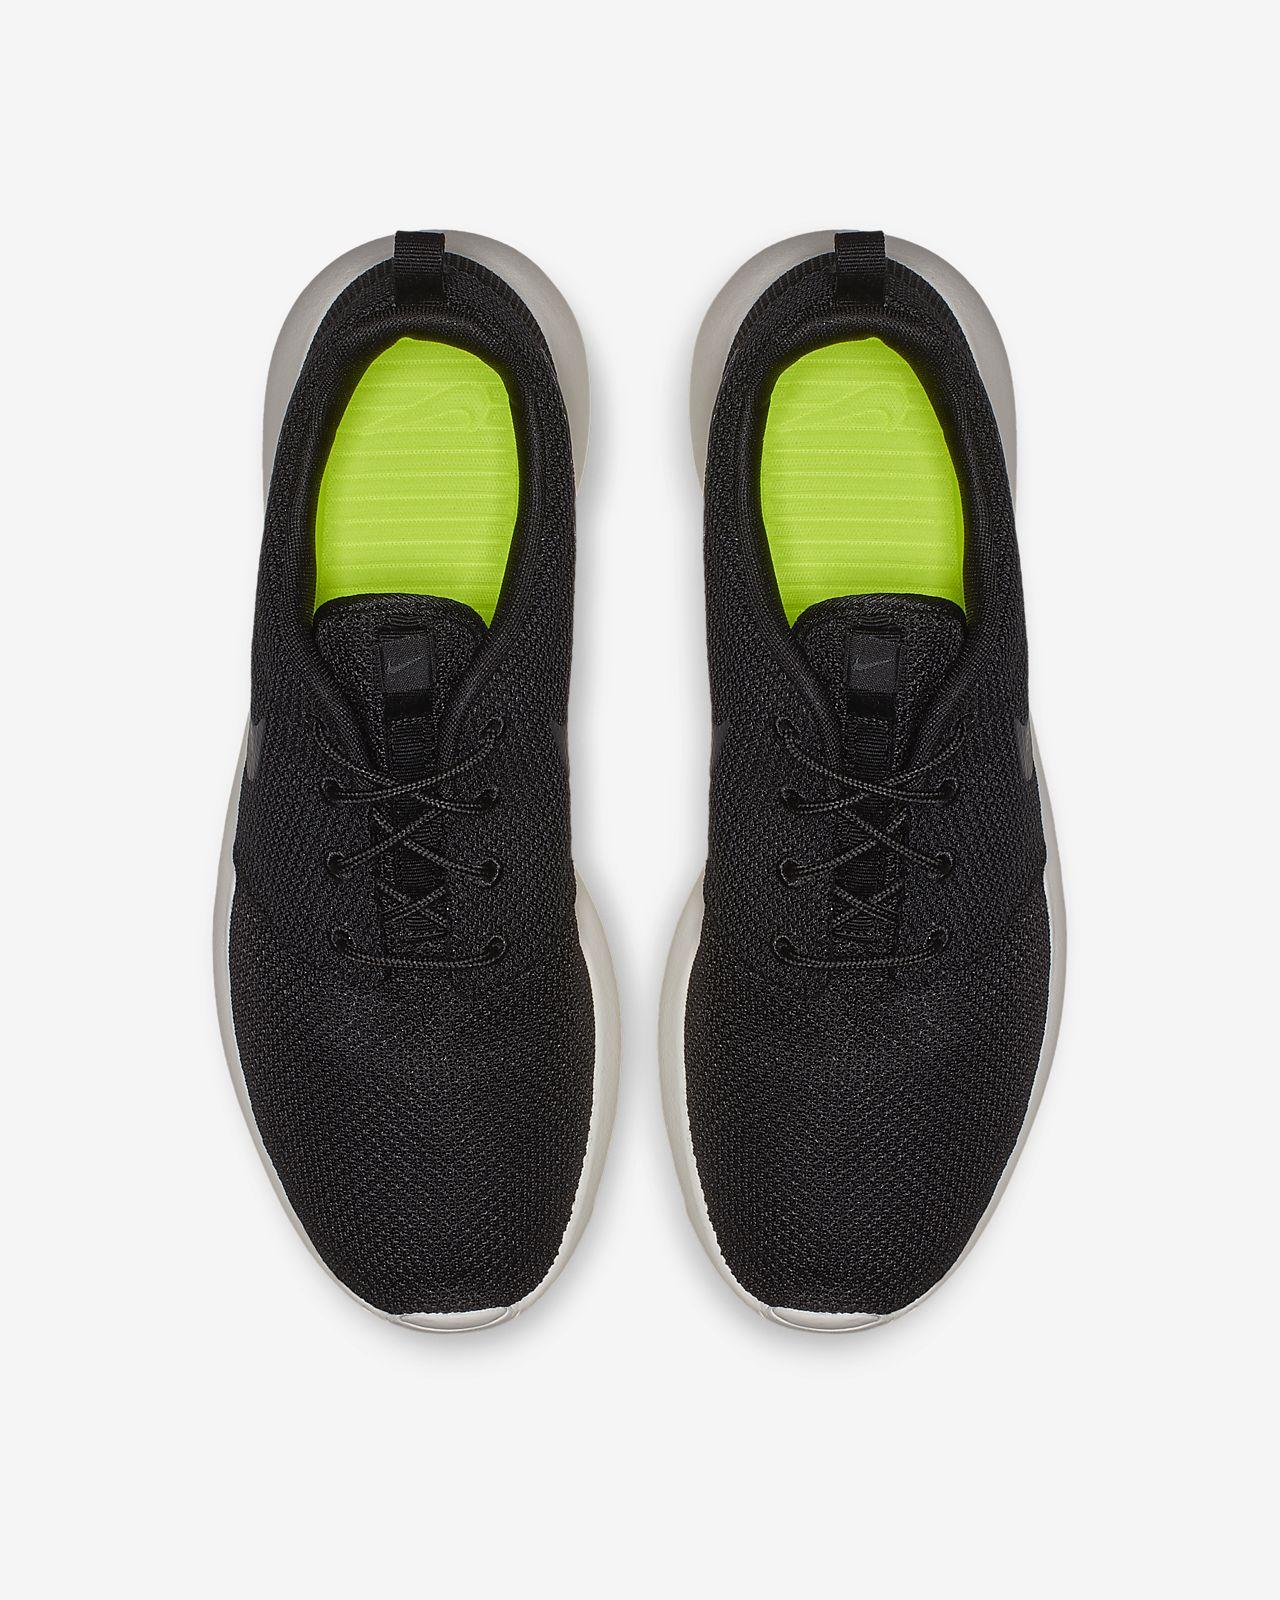 223b4e89c Nike Roshe One Men s Shoe. Nike.com